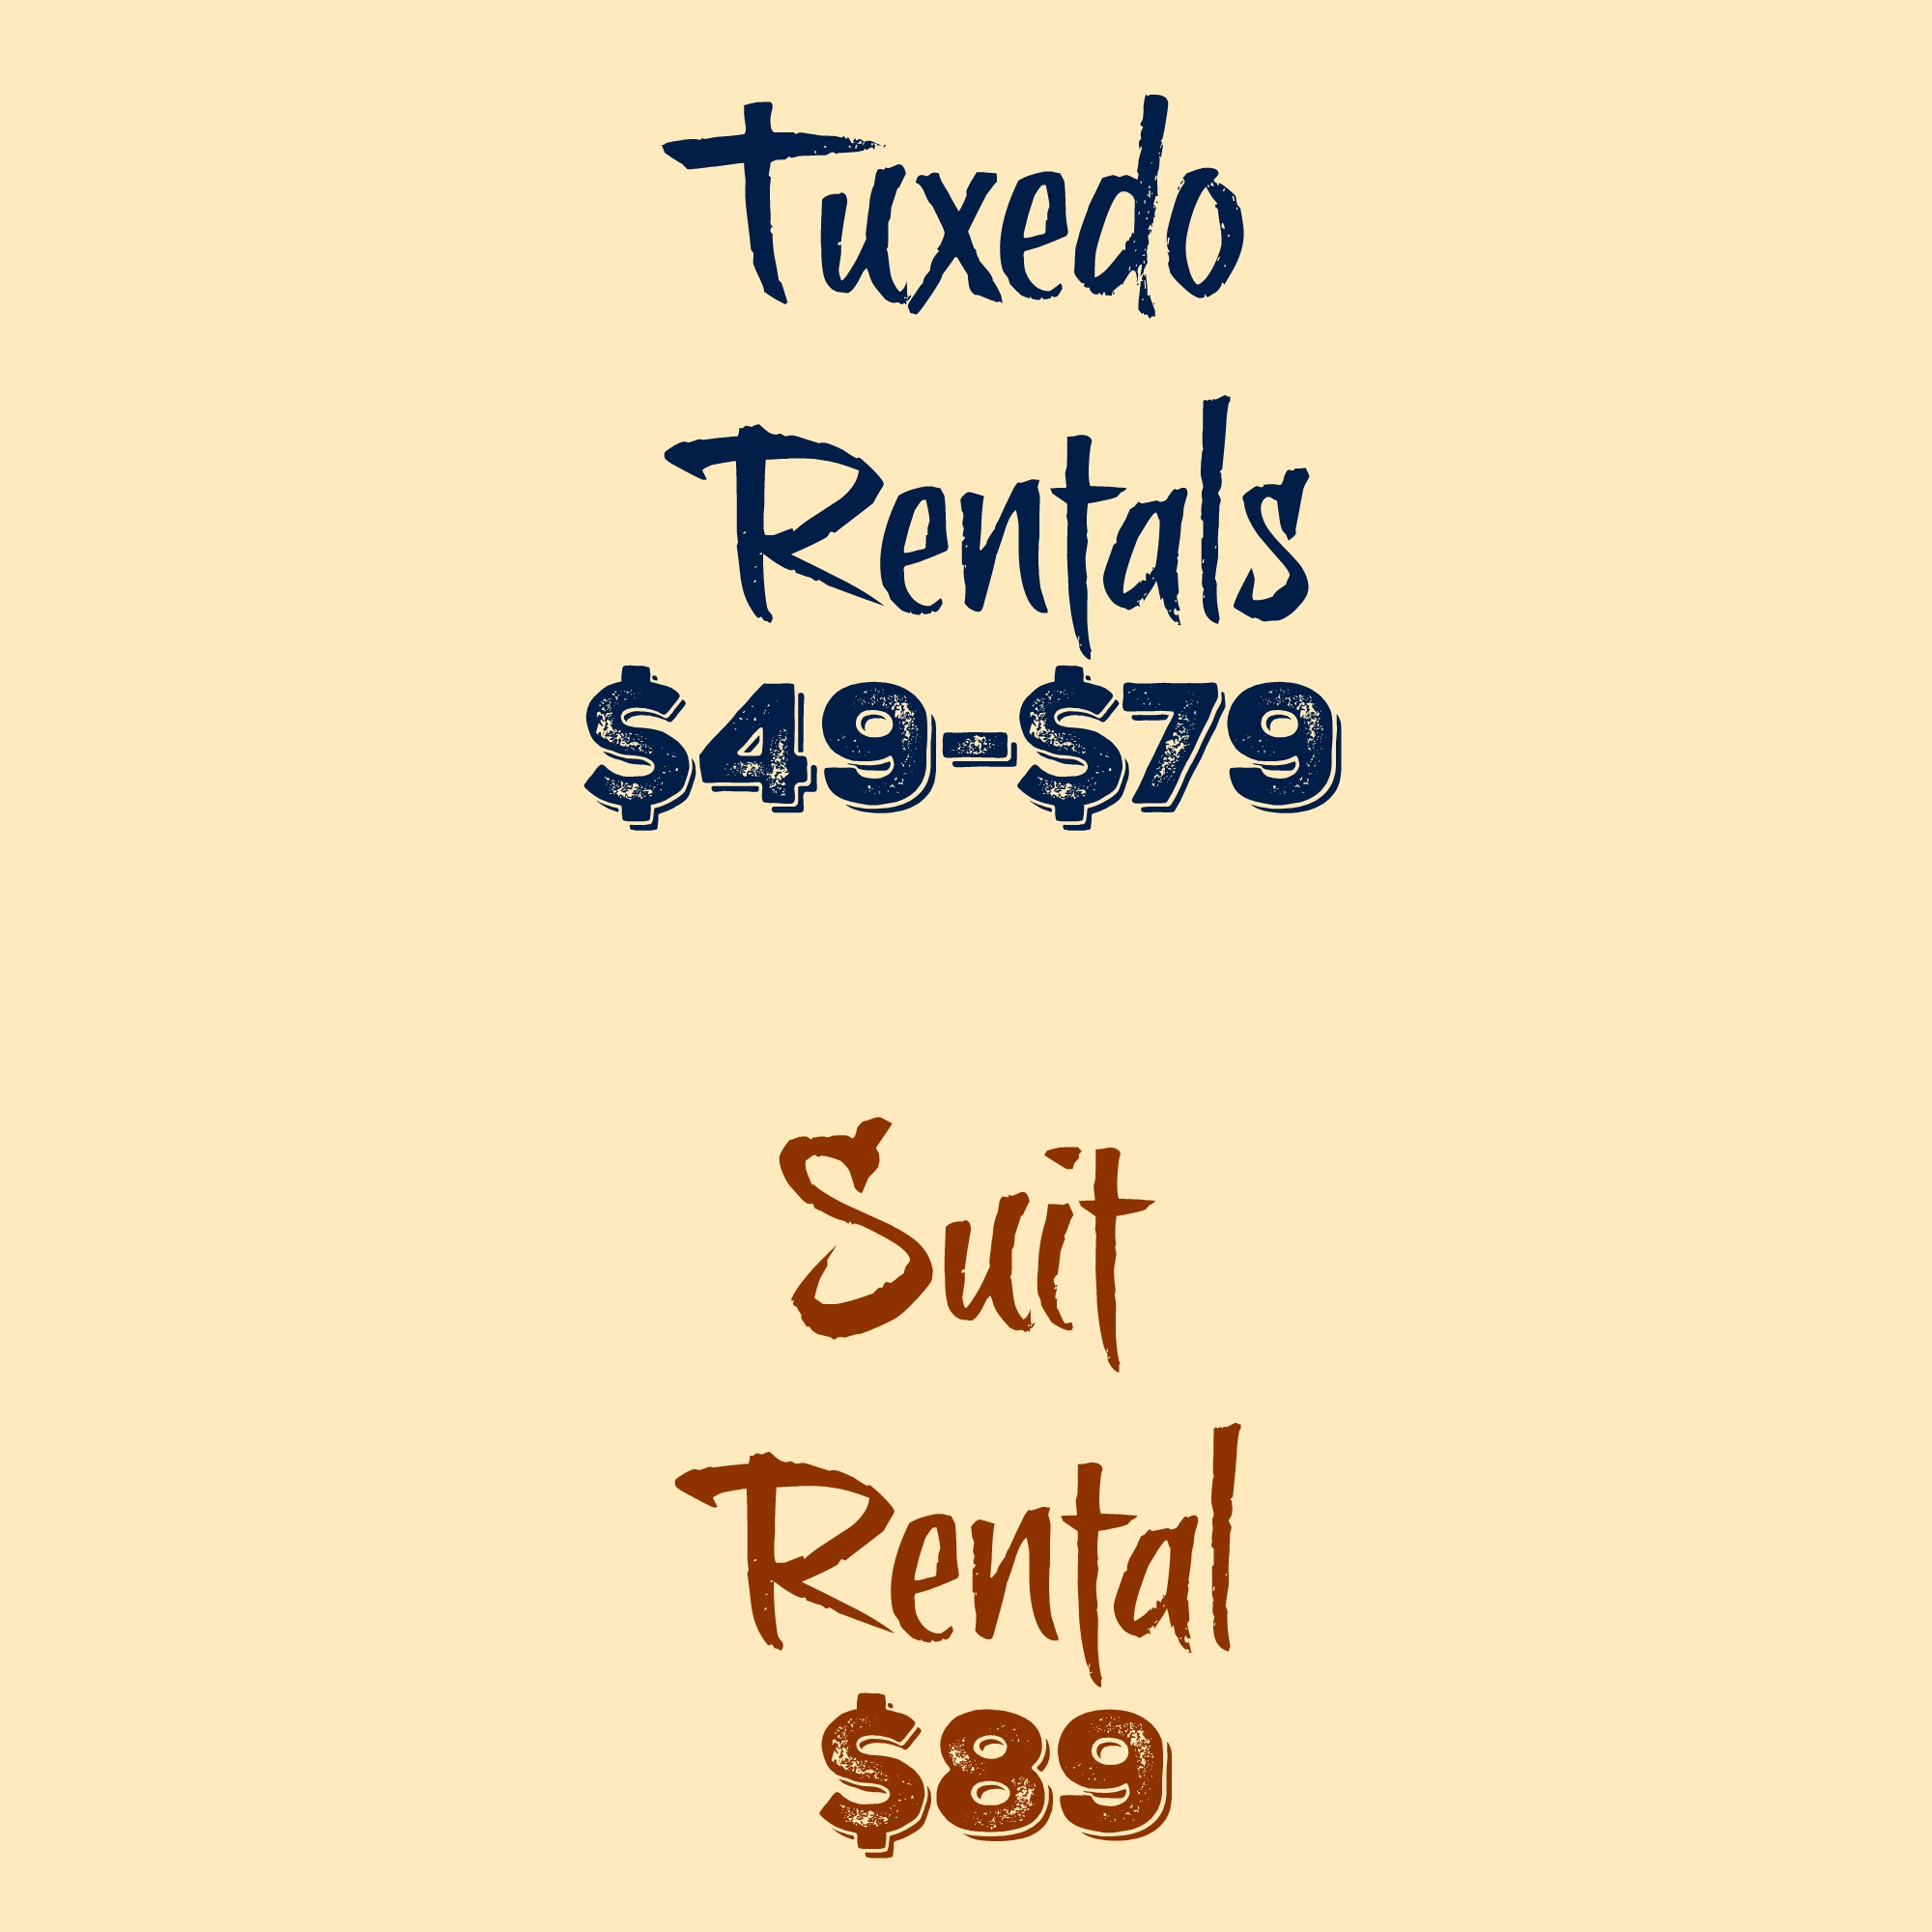 Tuxedo and Suit Rentals